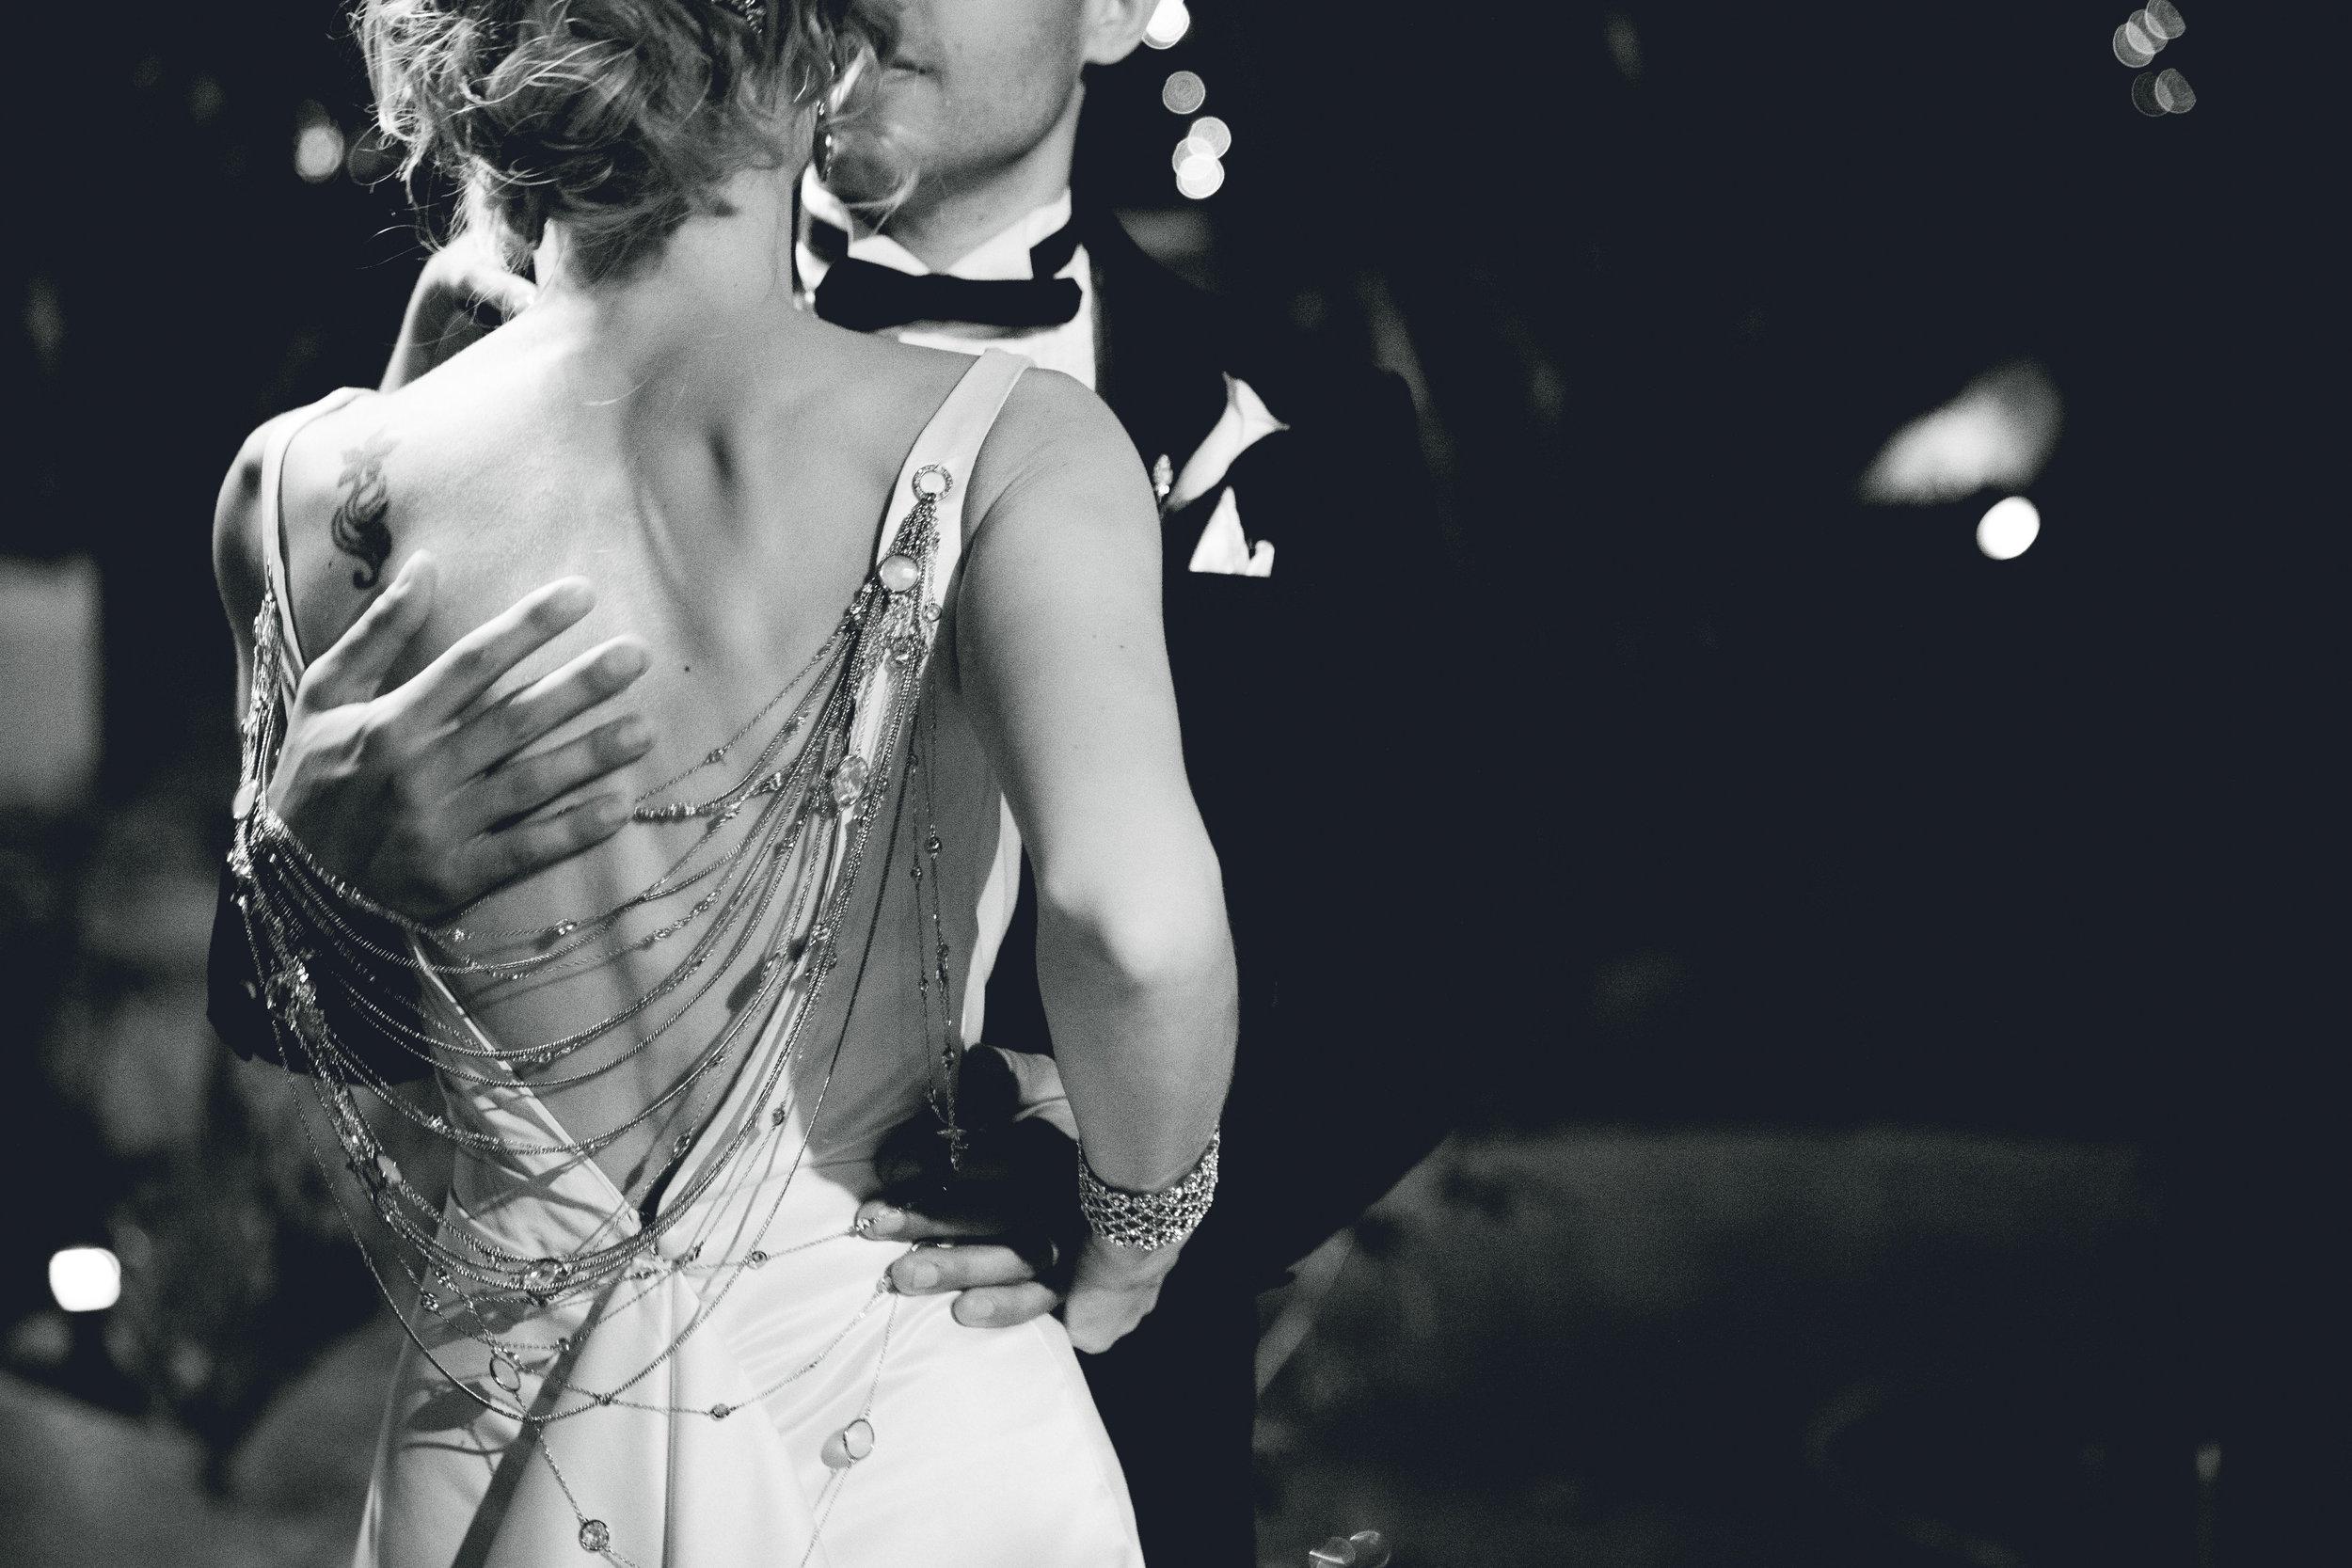 Chris Kristen October 2015 Wedding-Chris Kristen October 2015-0090.jpg